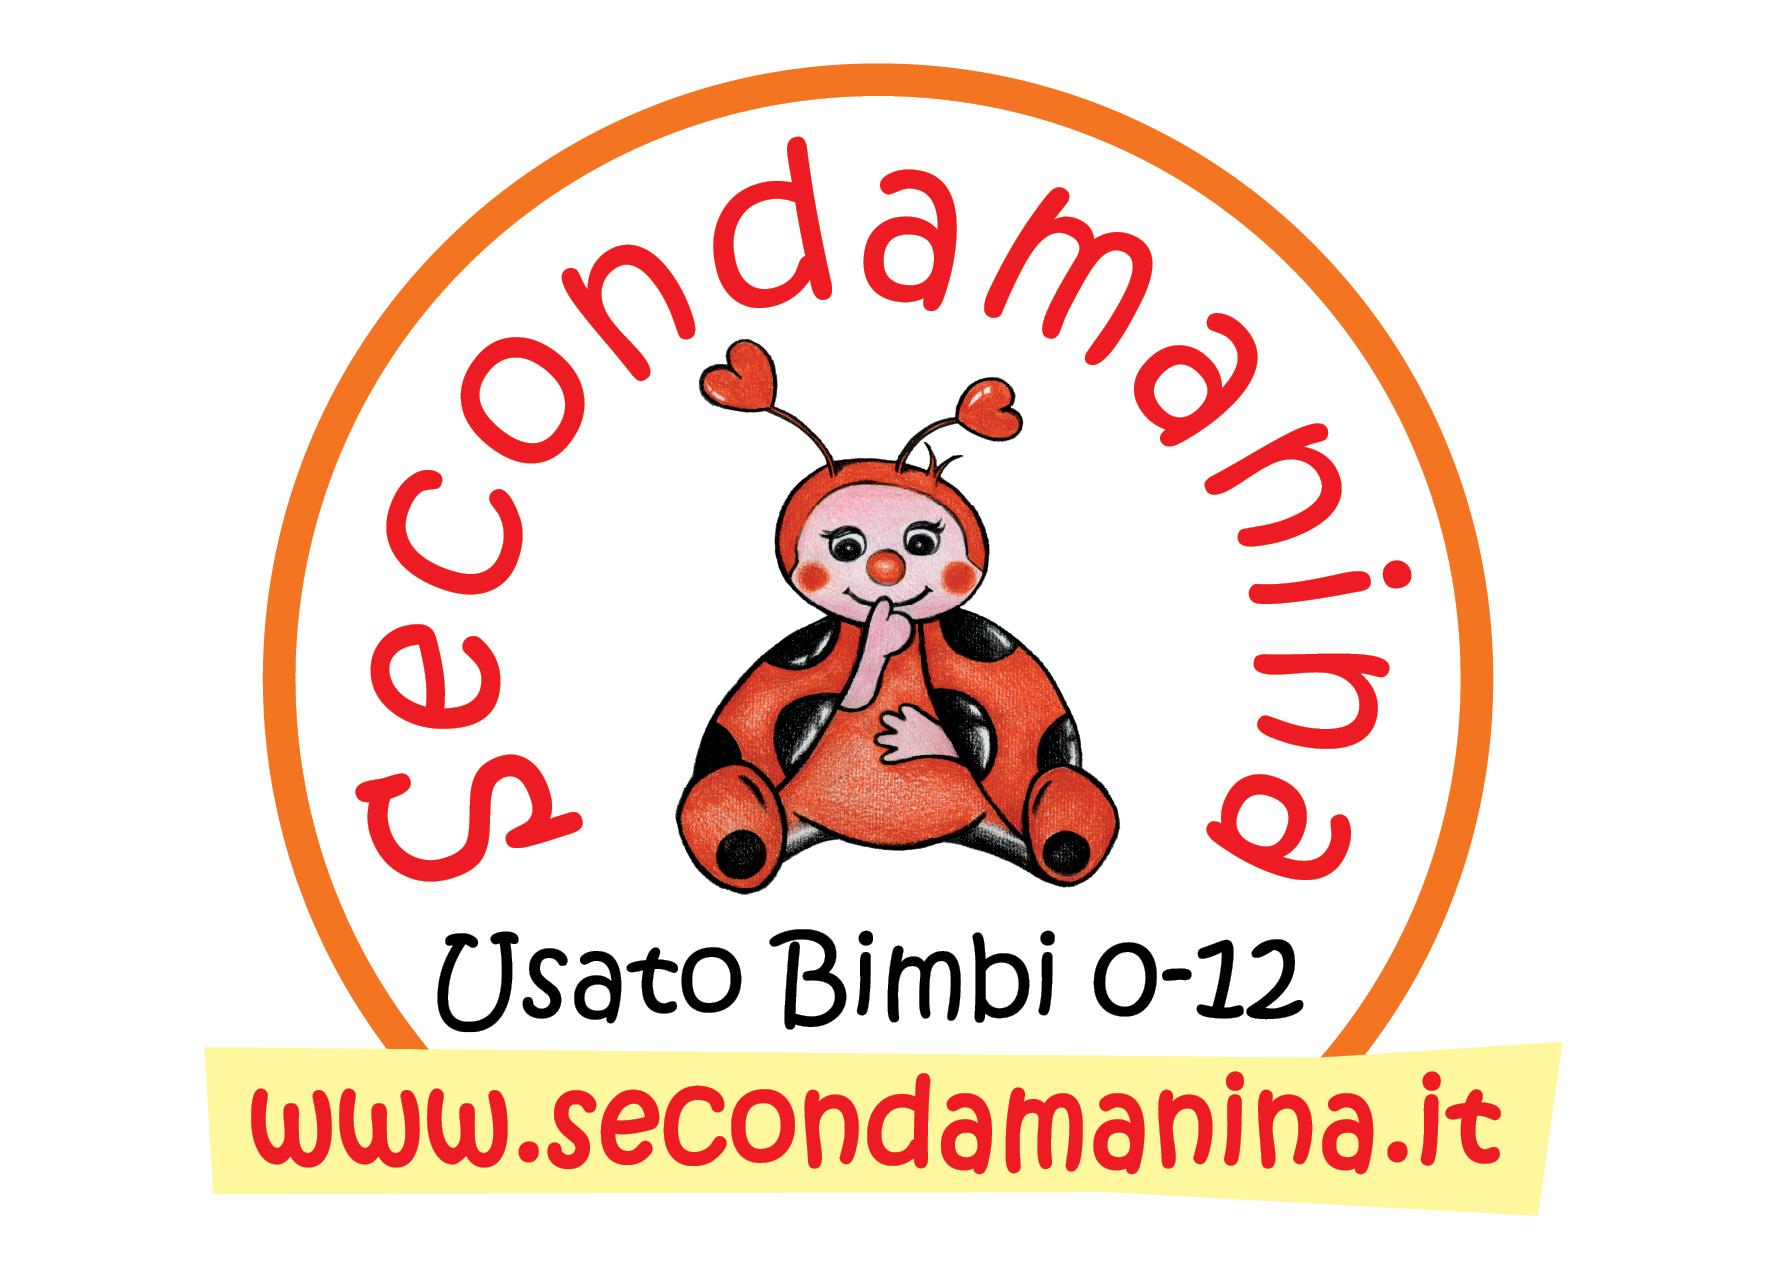 Secondamanina